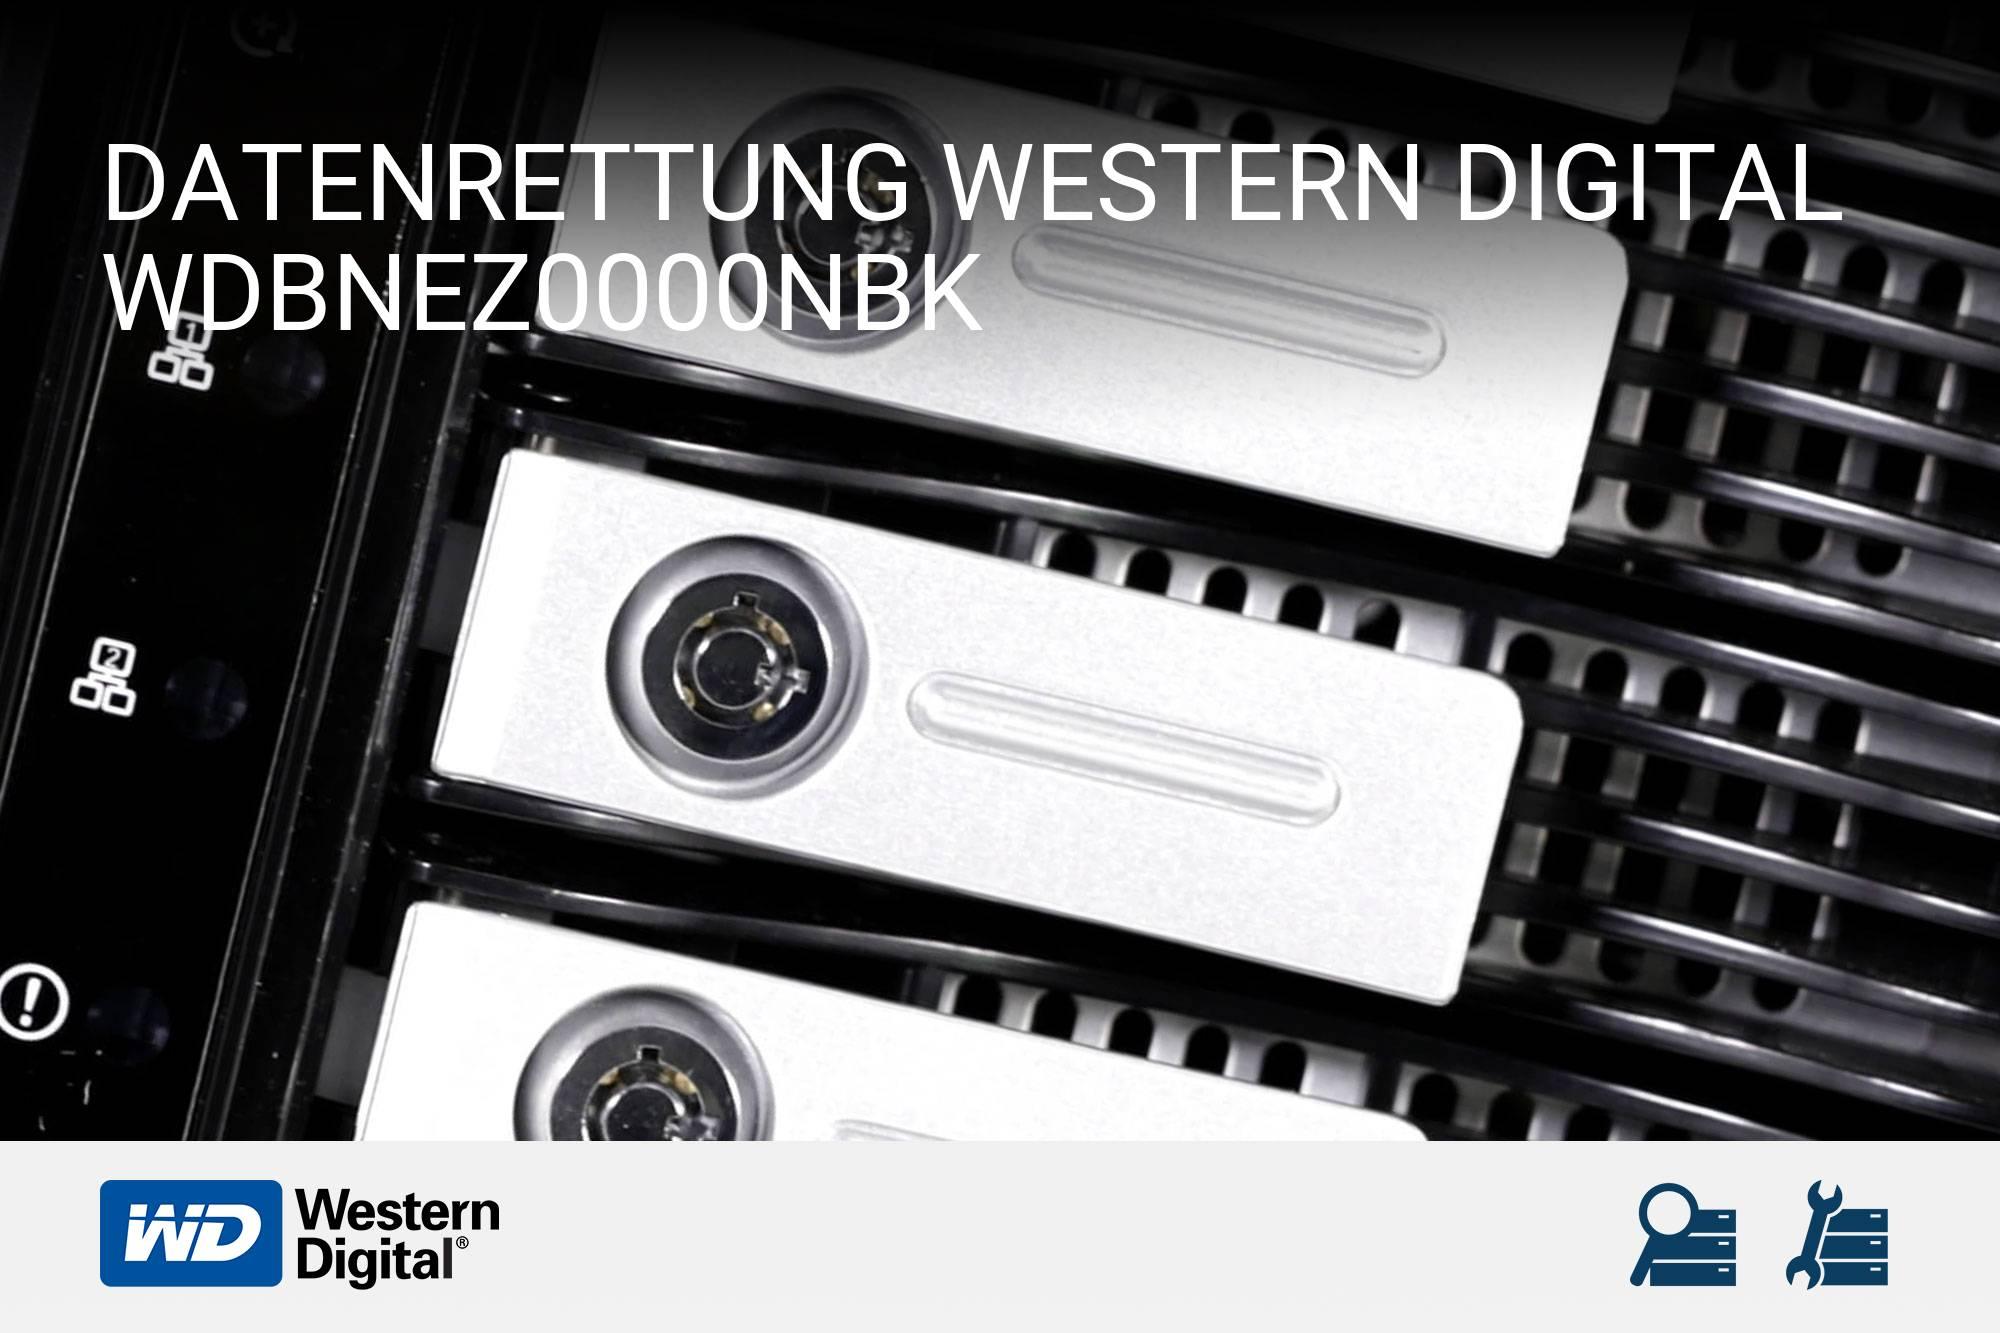 Western Digital WDBNEZ0000NBK